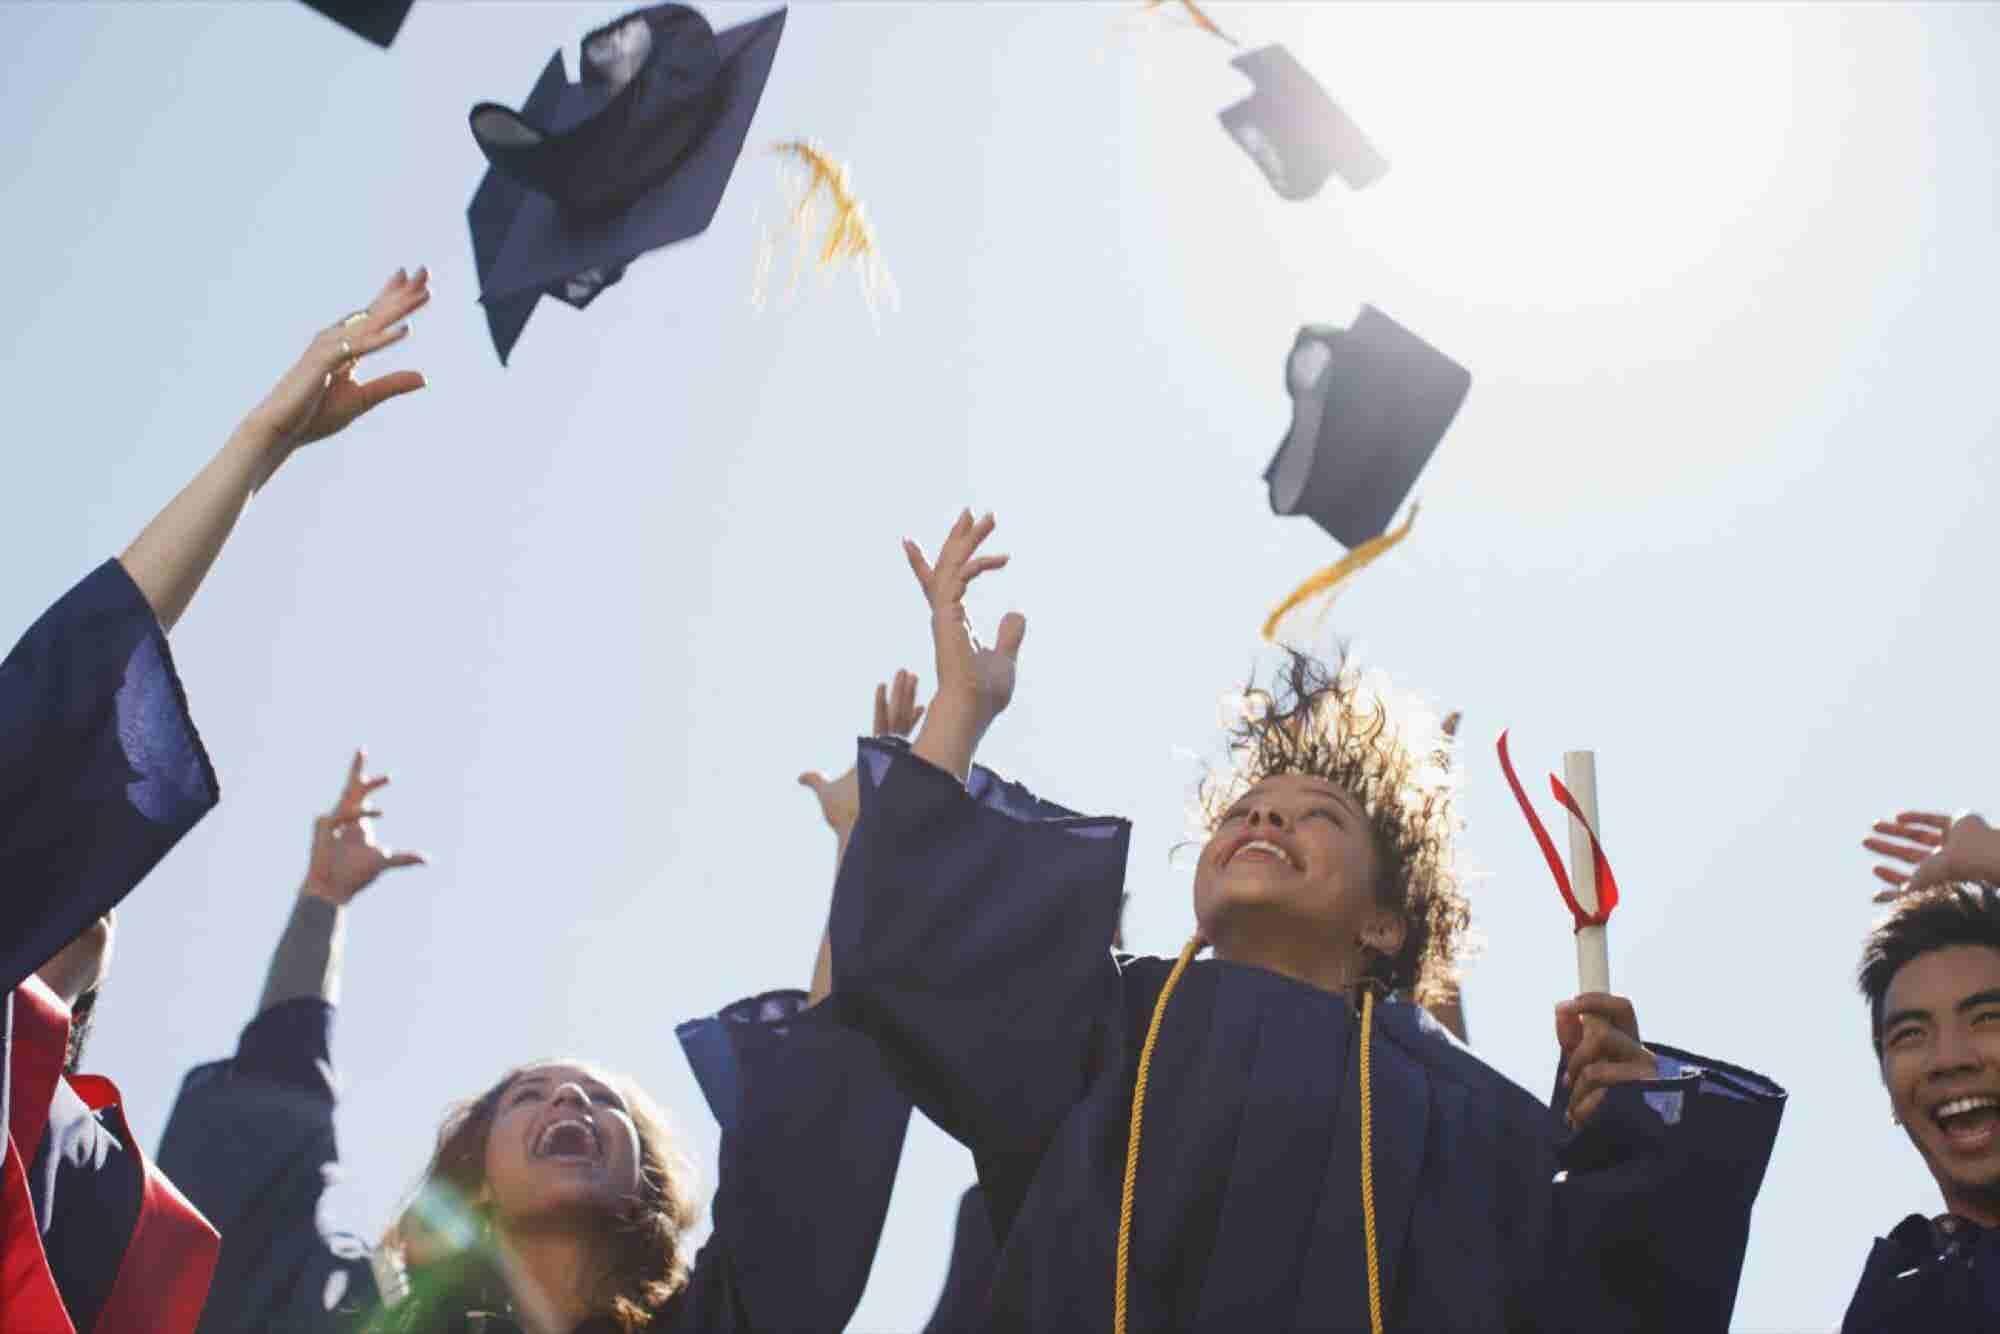 Top 25 Best Undergrad Programs for Entrepreneurs in 2018